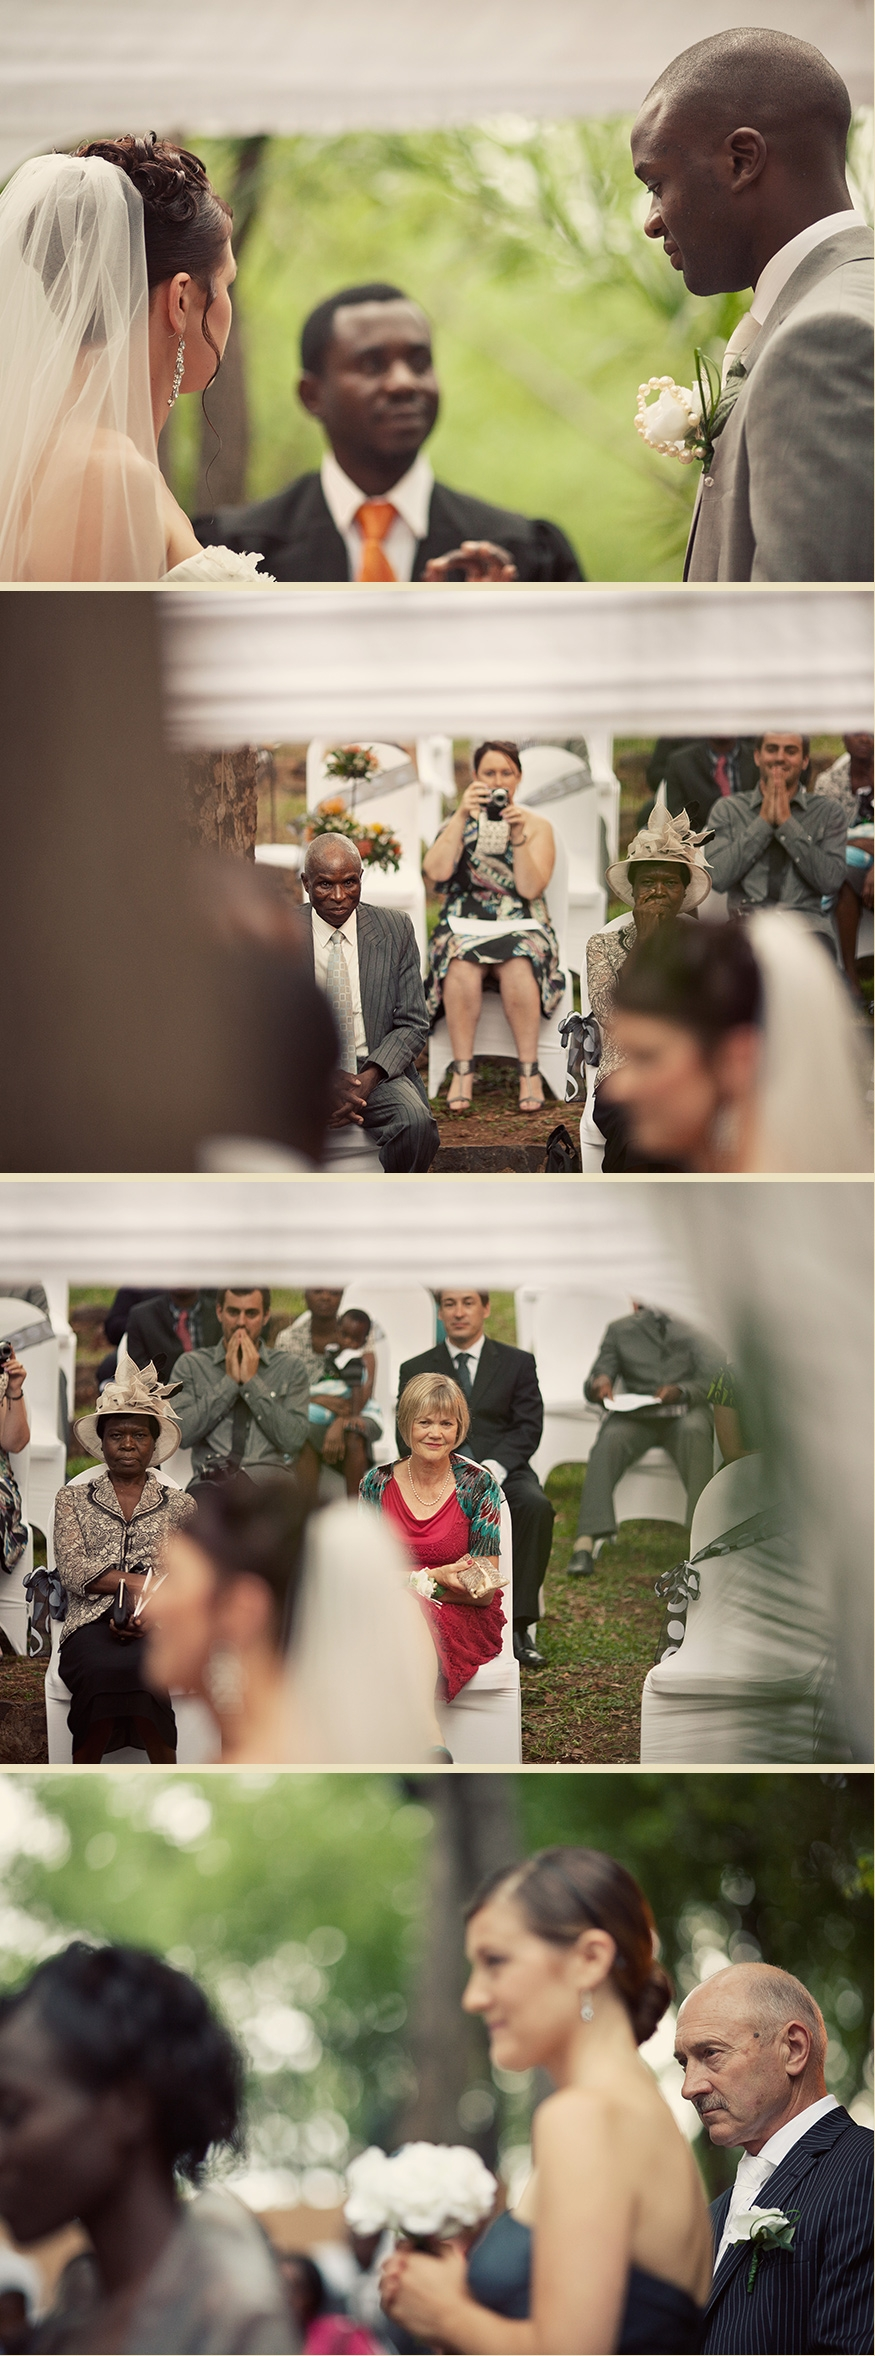 Brisbane Wedding Phoographer Blog-collage-1329182806606